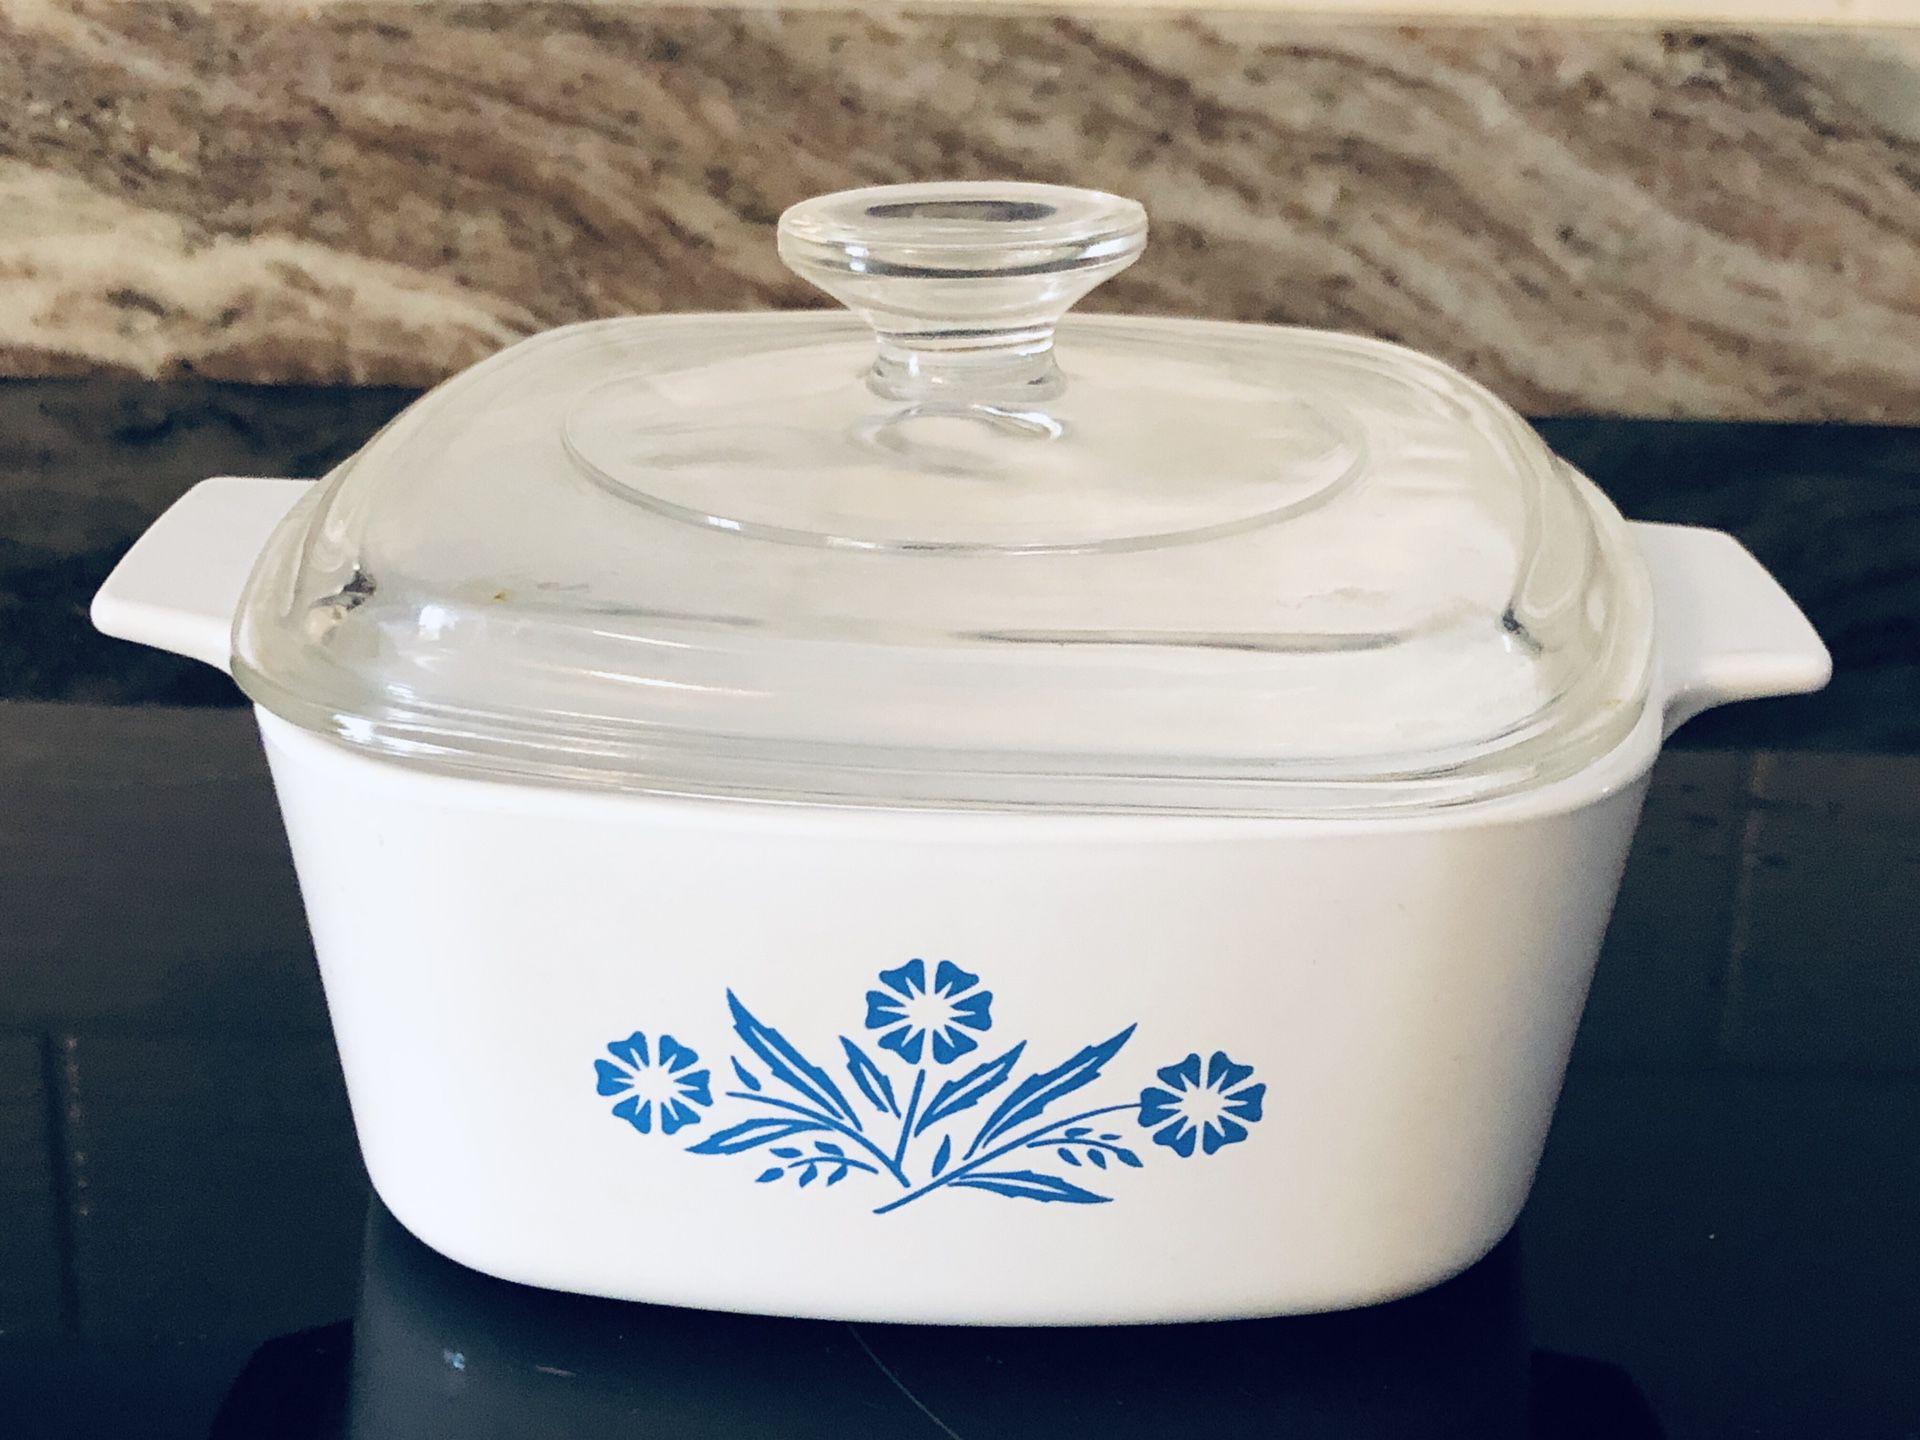 1.5 Quart Corning Ware Blue cornflower with lid